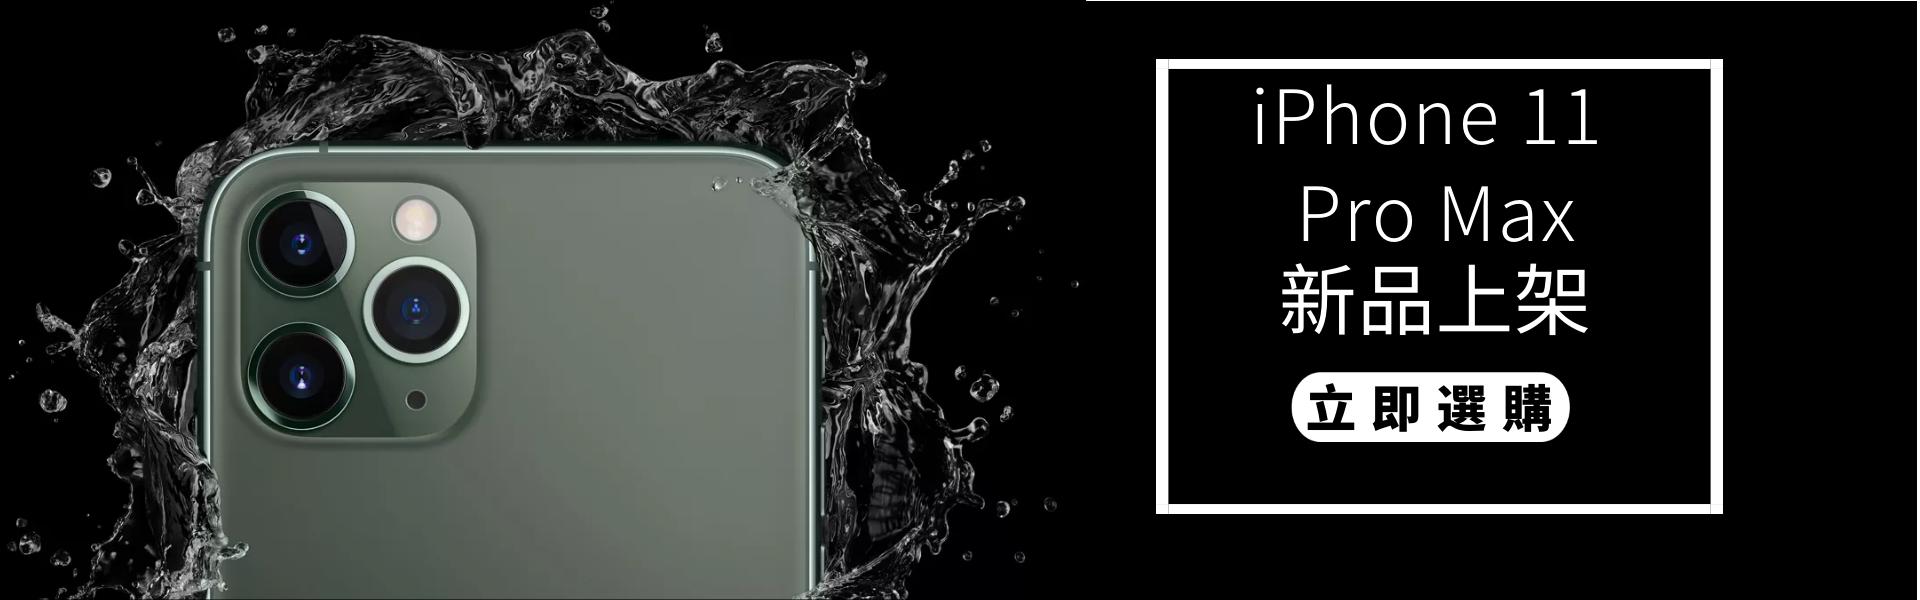 uag手機殼,太樂芬手機殼,uag,太樂芬,iphone11promax